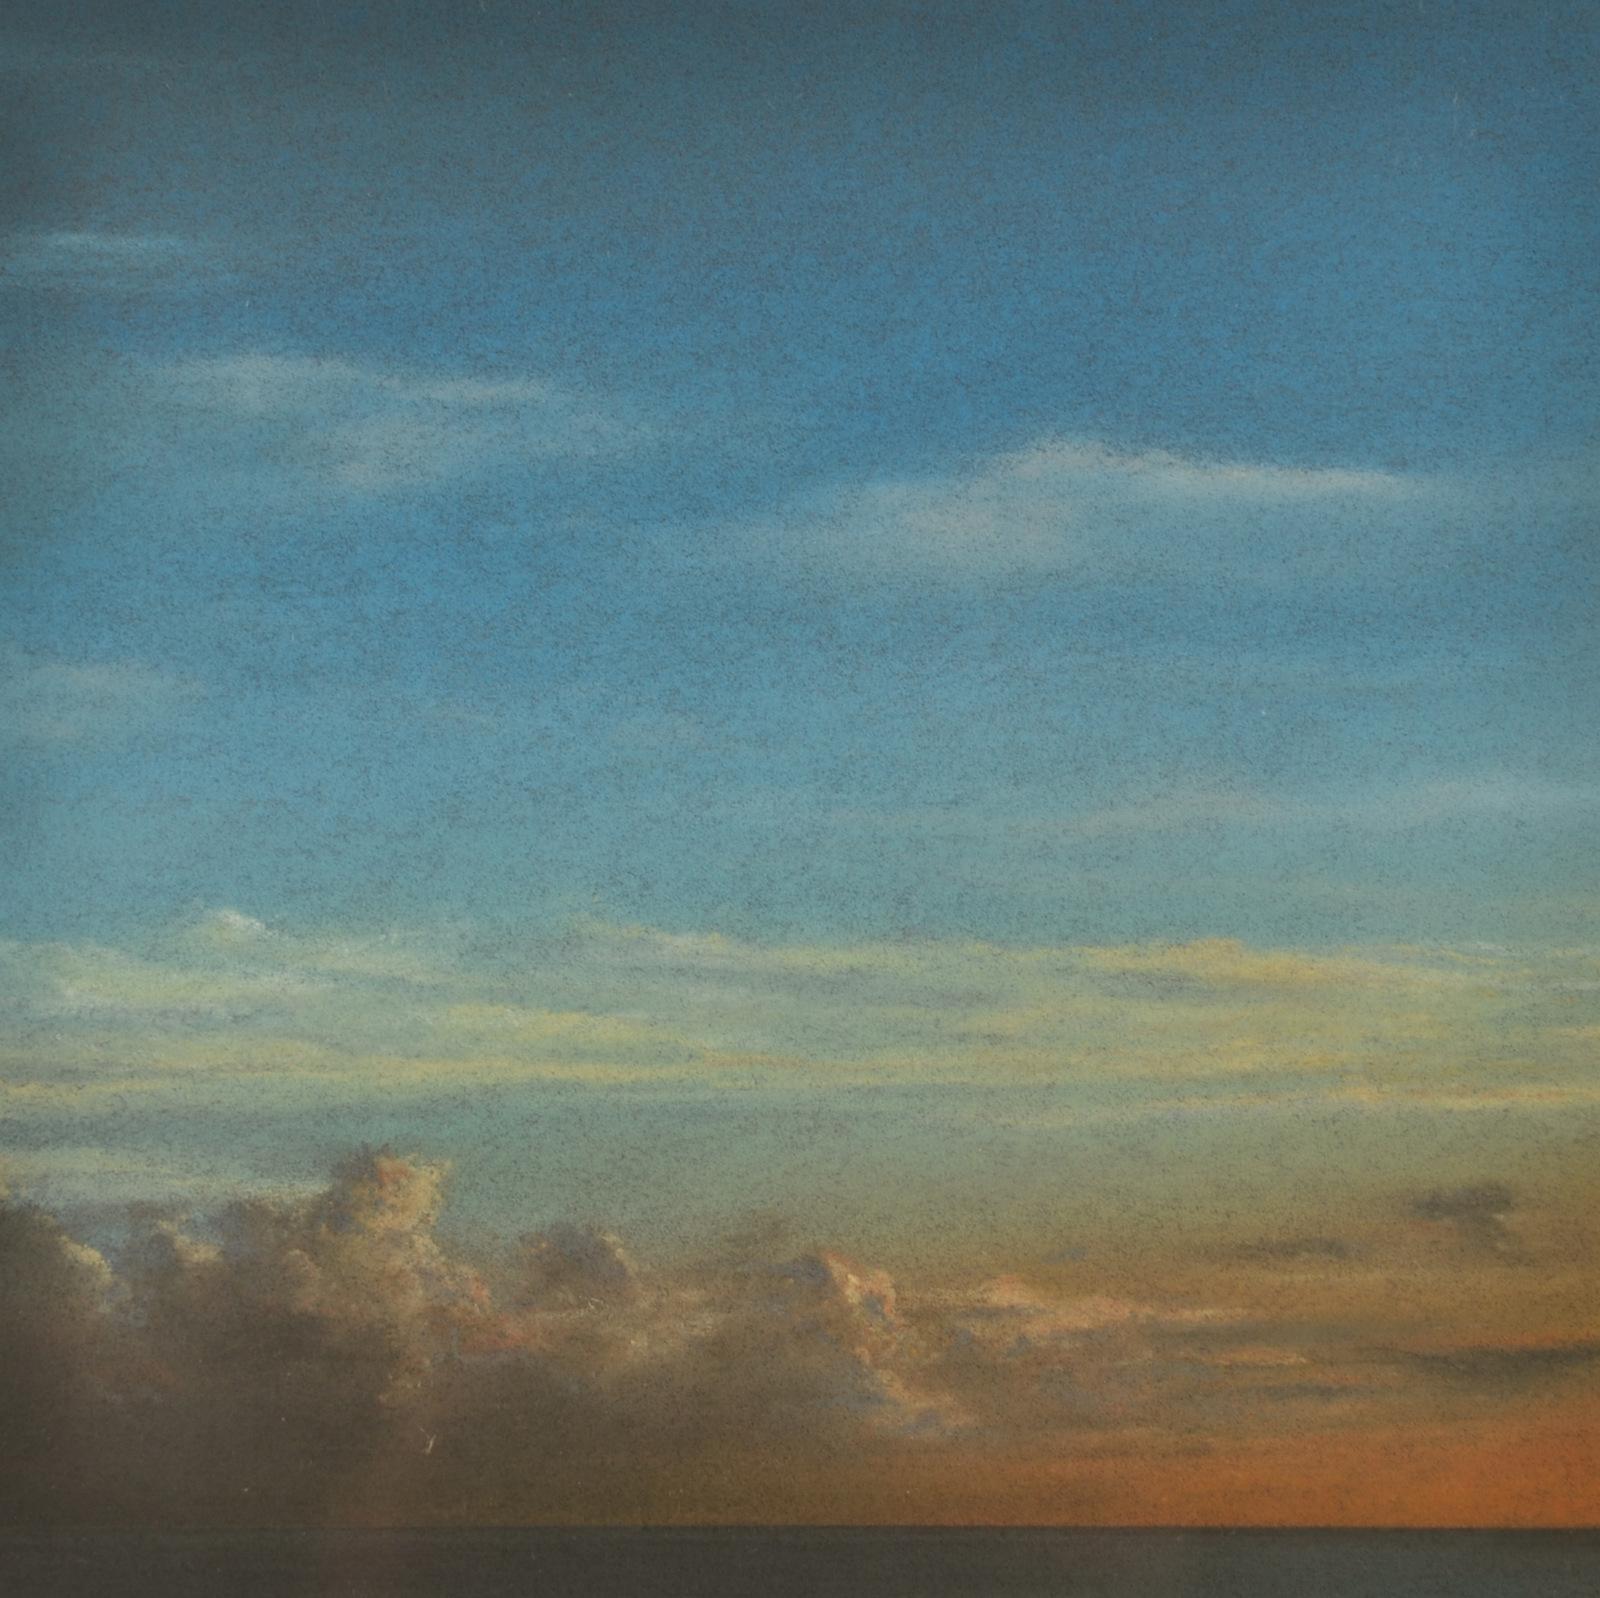 Lot 48 - JOHN HOWARD Sky Study,